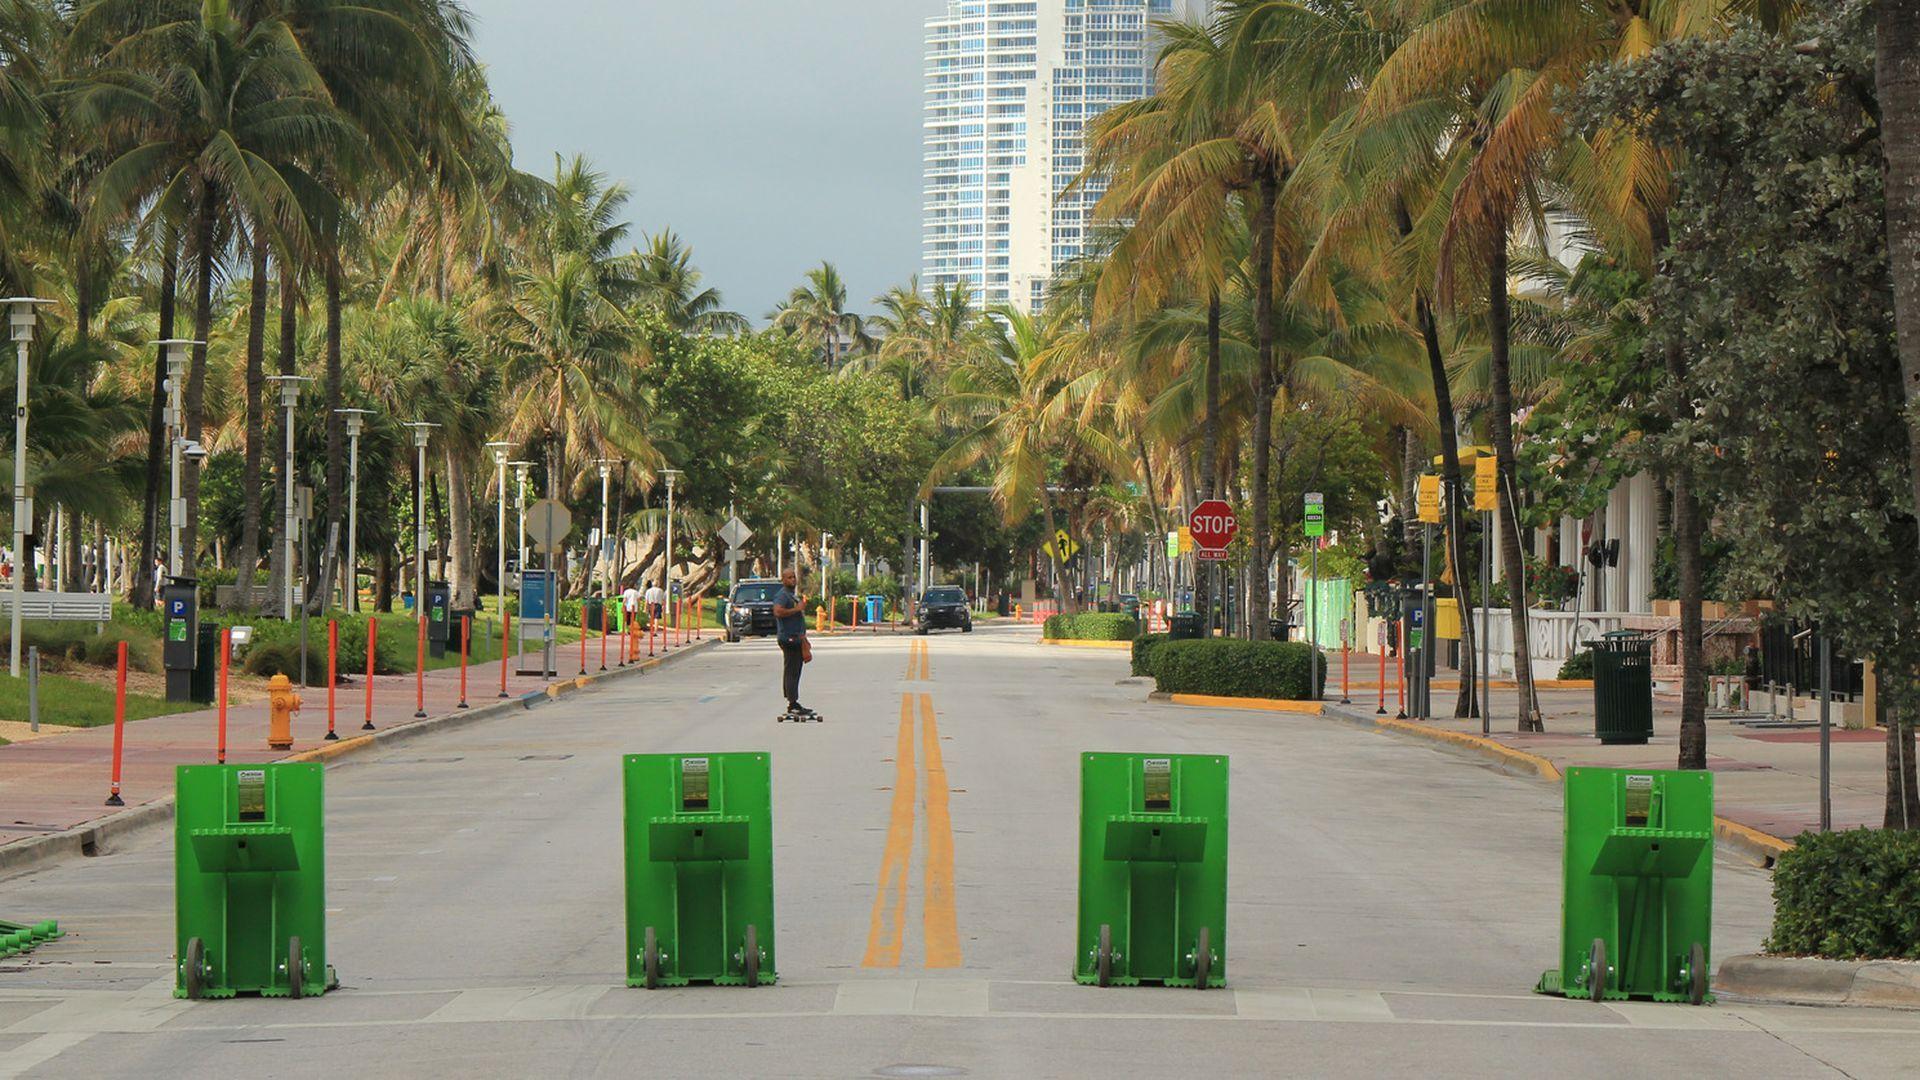 Vehicle barricades used in Miami Beach